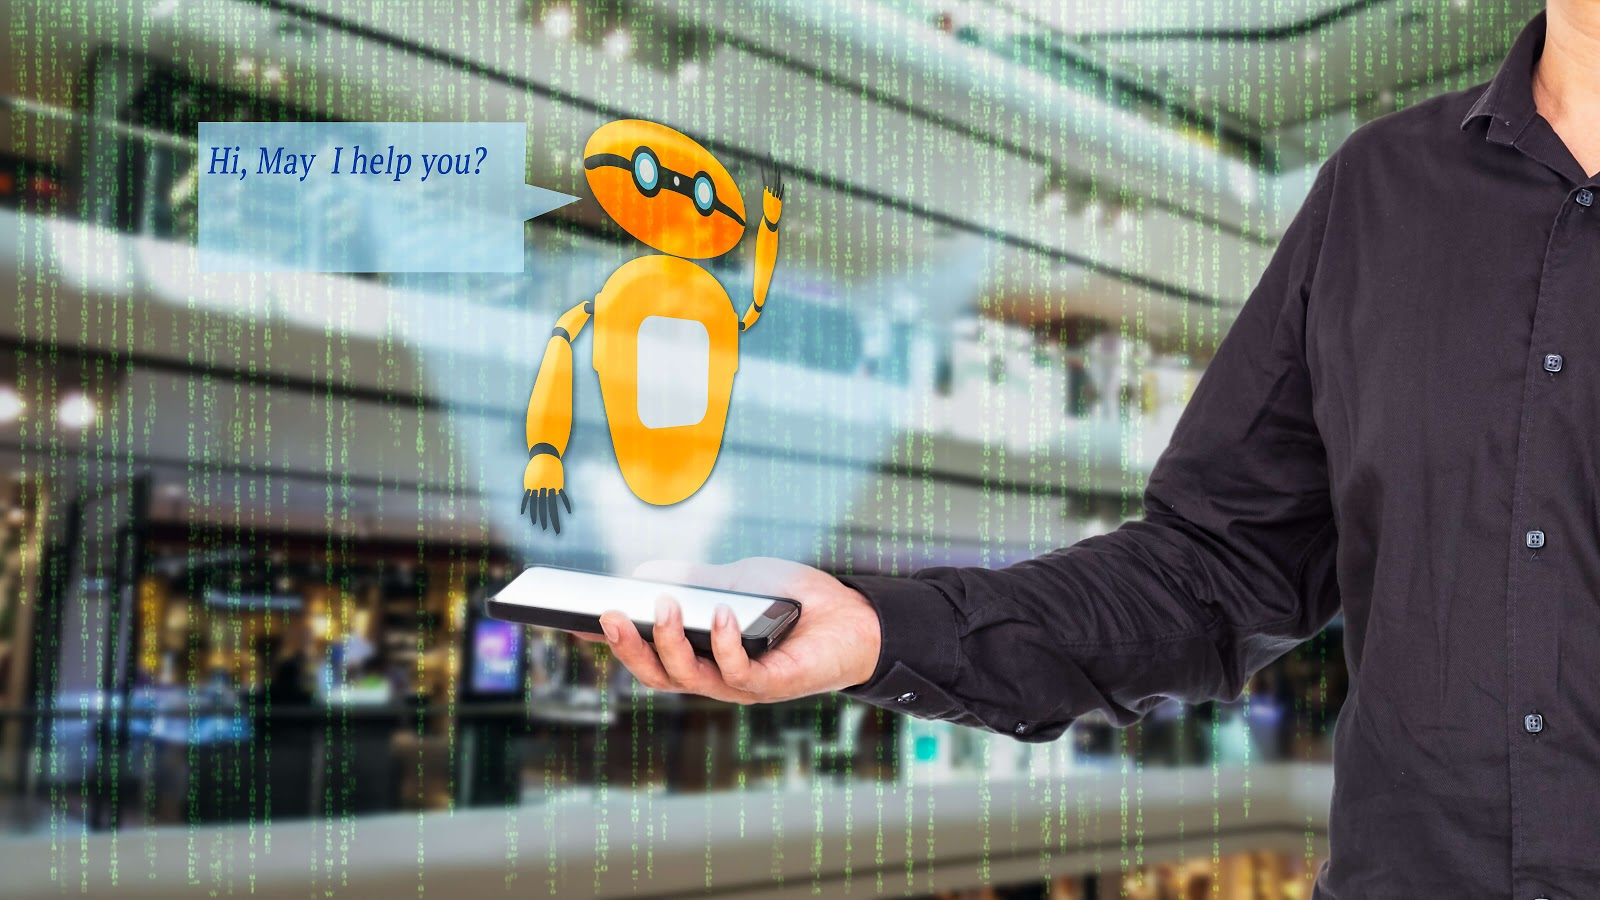 Chatbots Provide Instant Communication